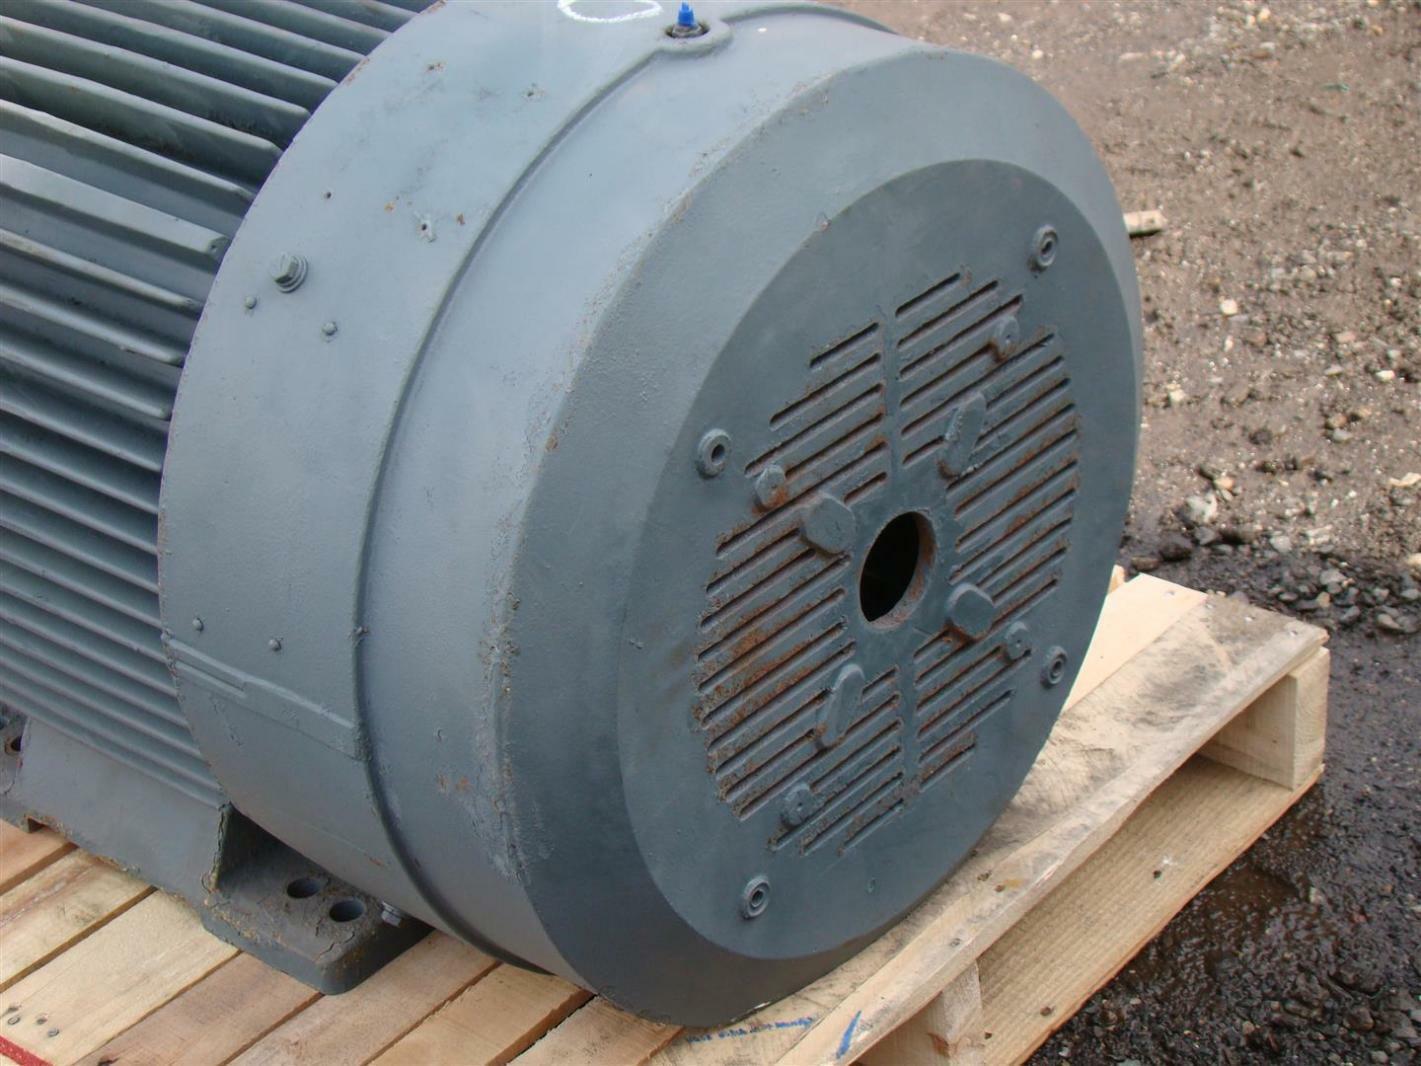 Reliance Electric Motor 100hp 1780rpm 3ph 32mn404550 G 005